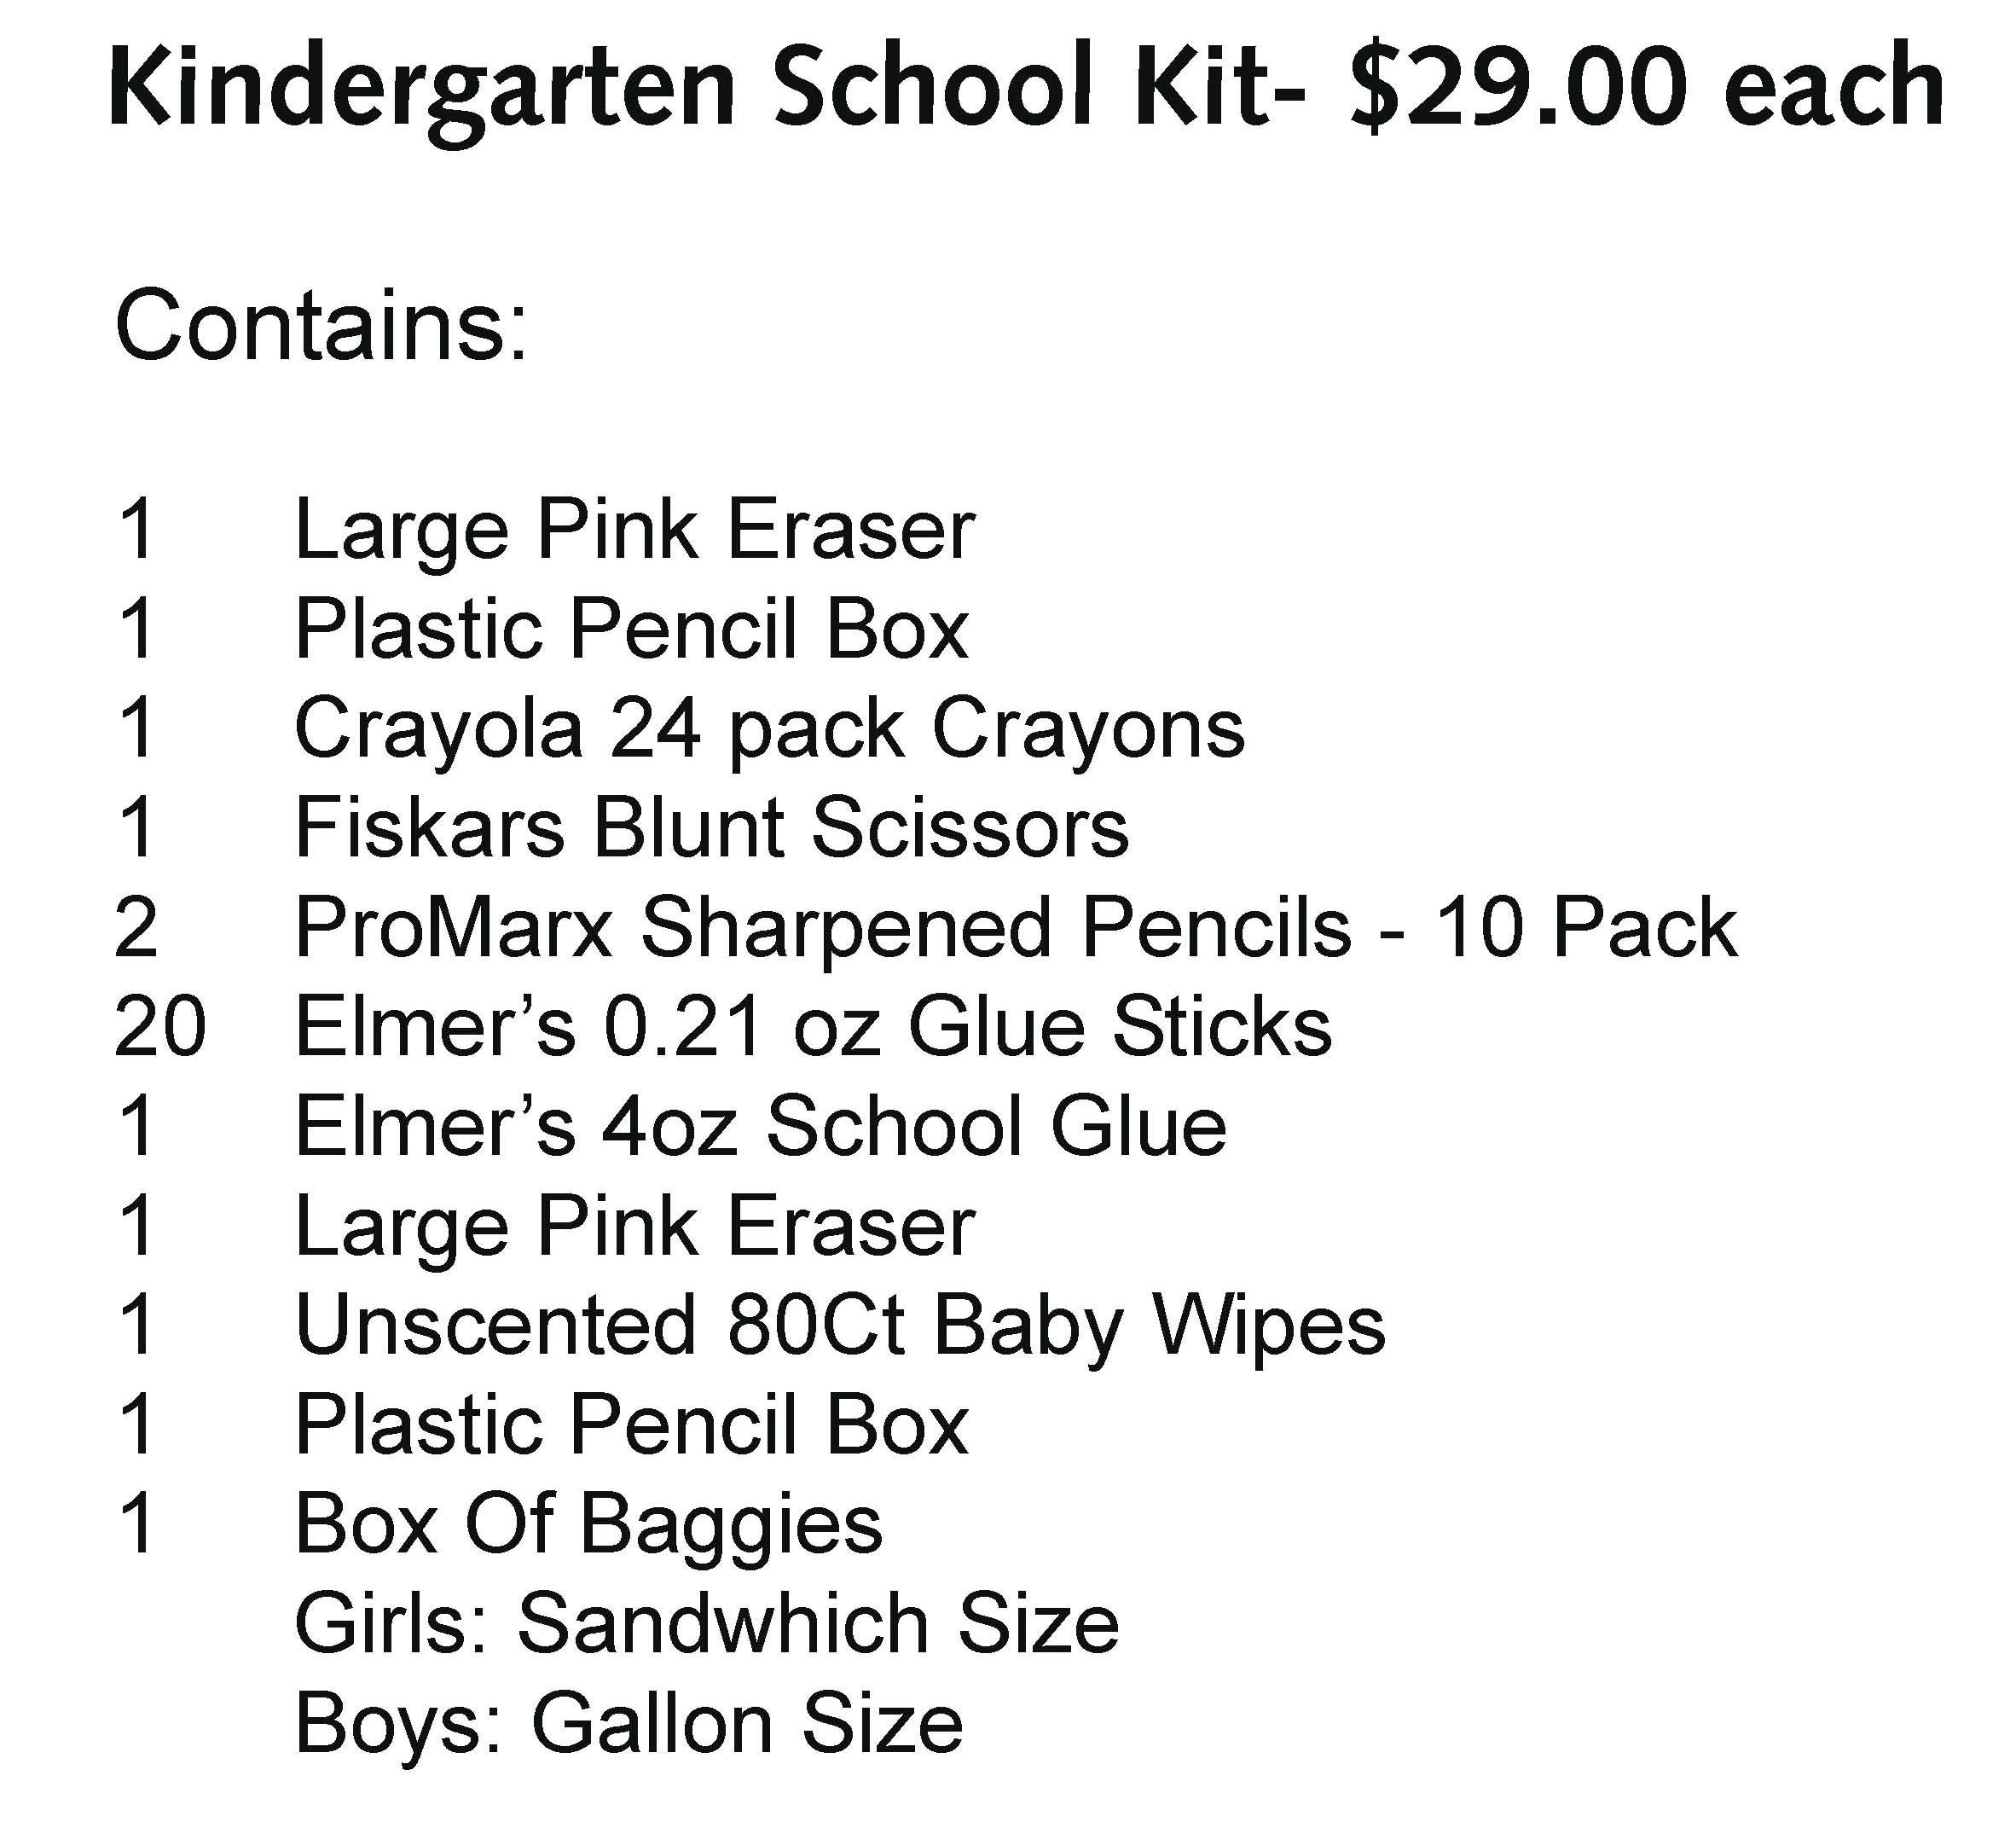 General Herkimer Kindergarten Kit